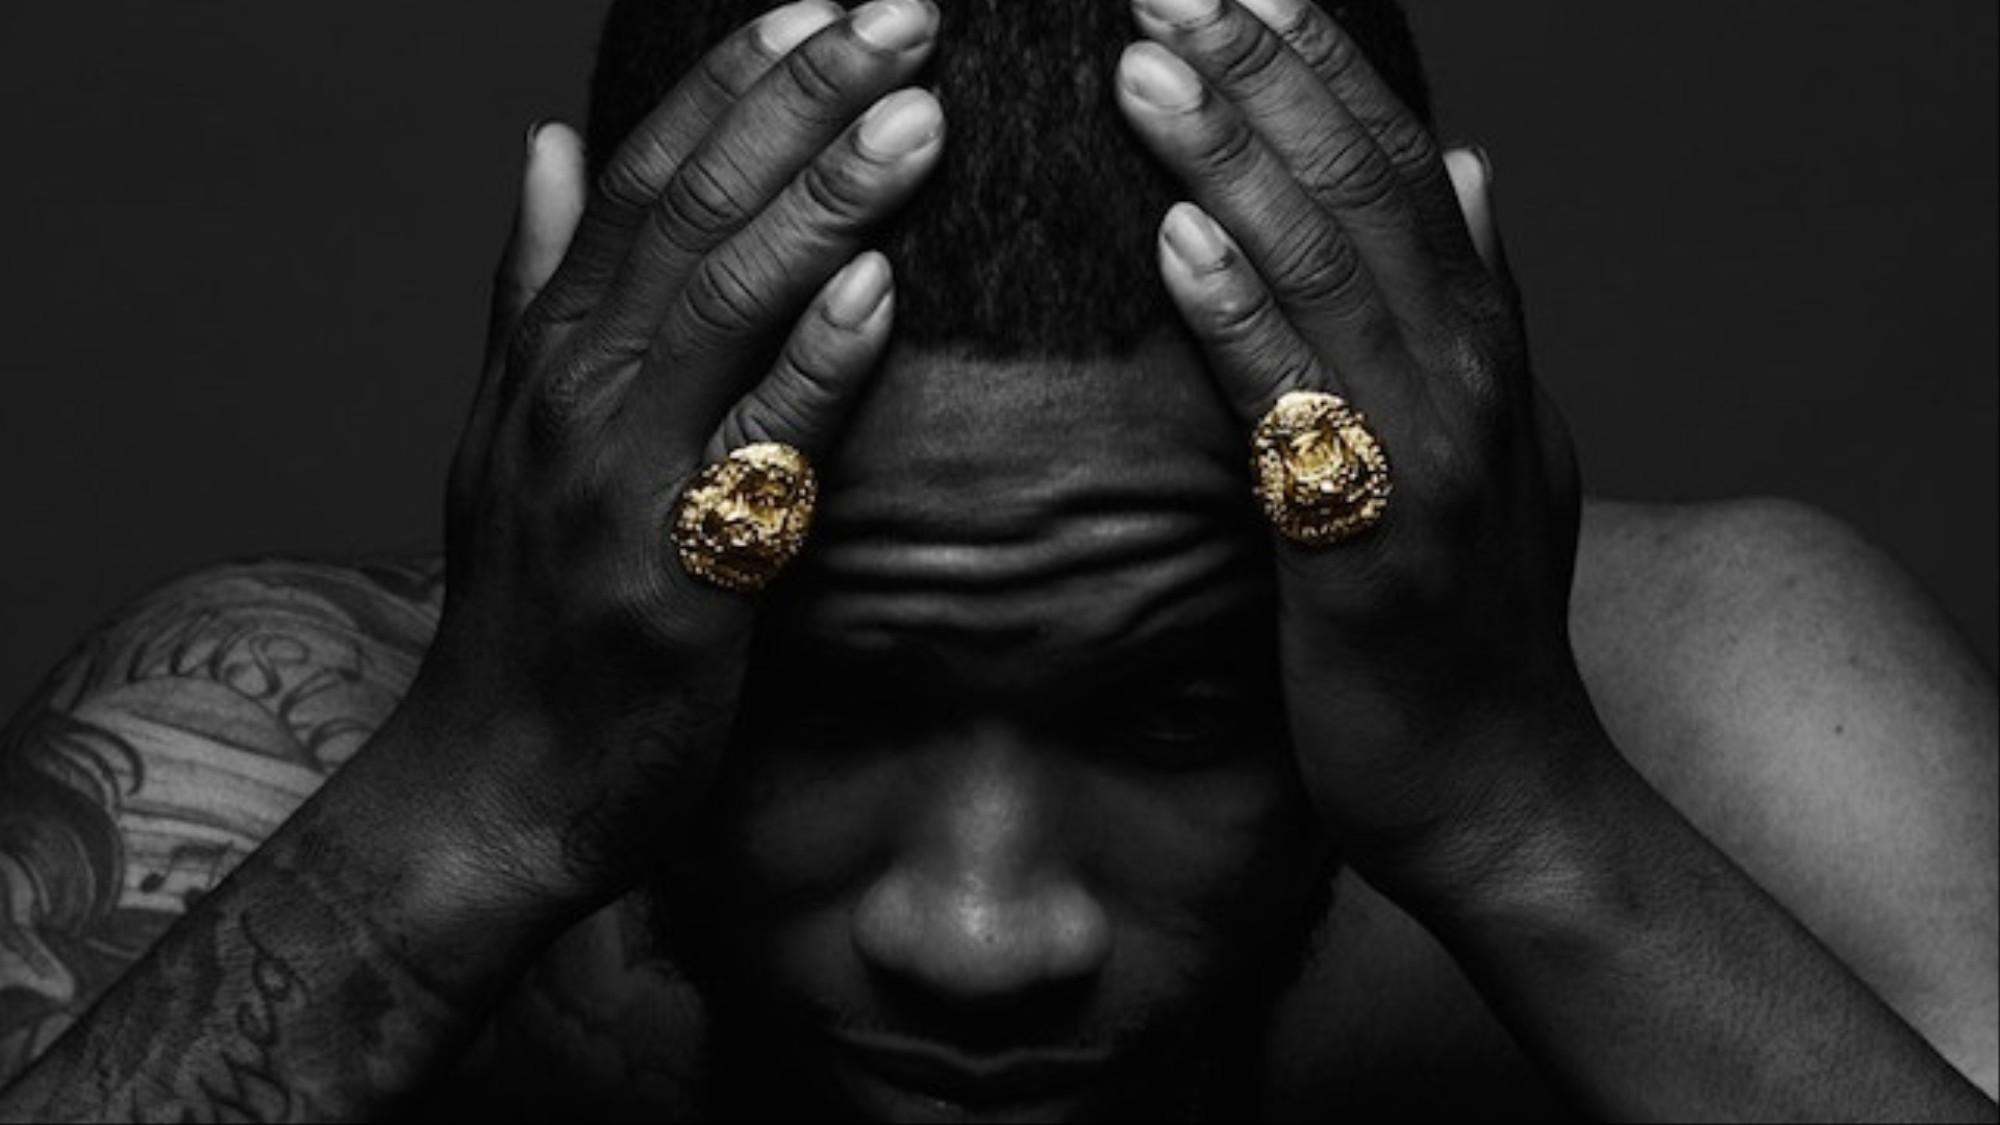 Stream Rapper/Singer Tory Lanez New Mixtapes 'Chixtape 3